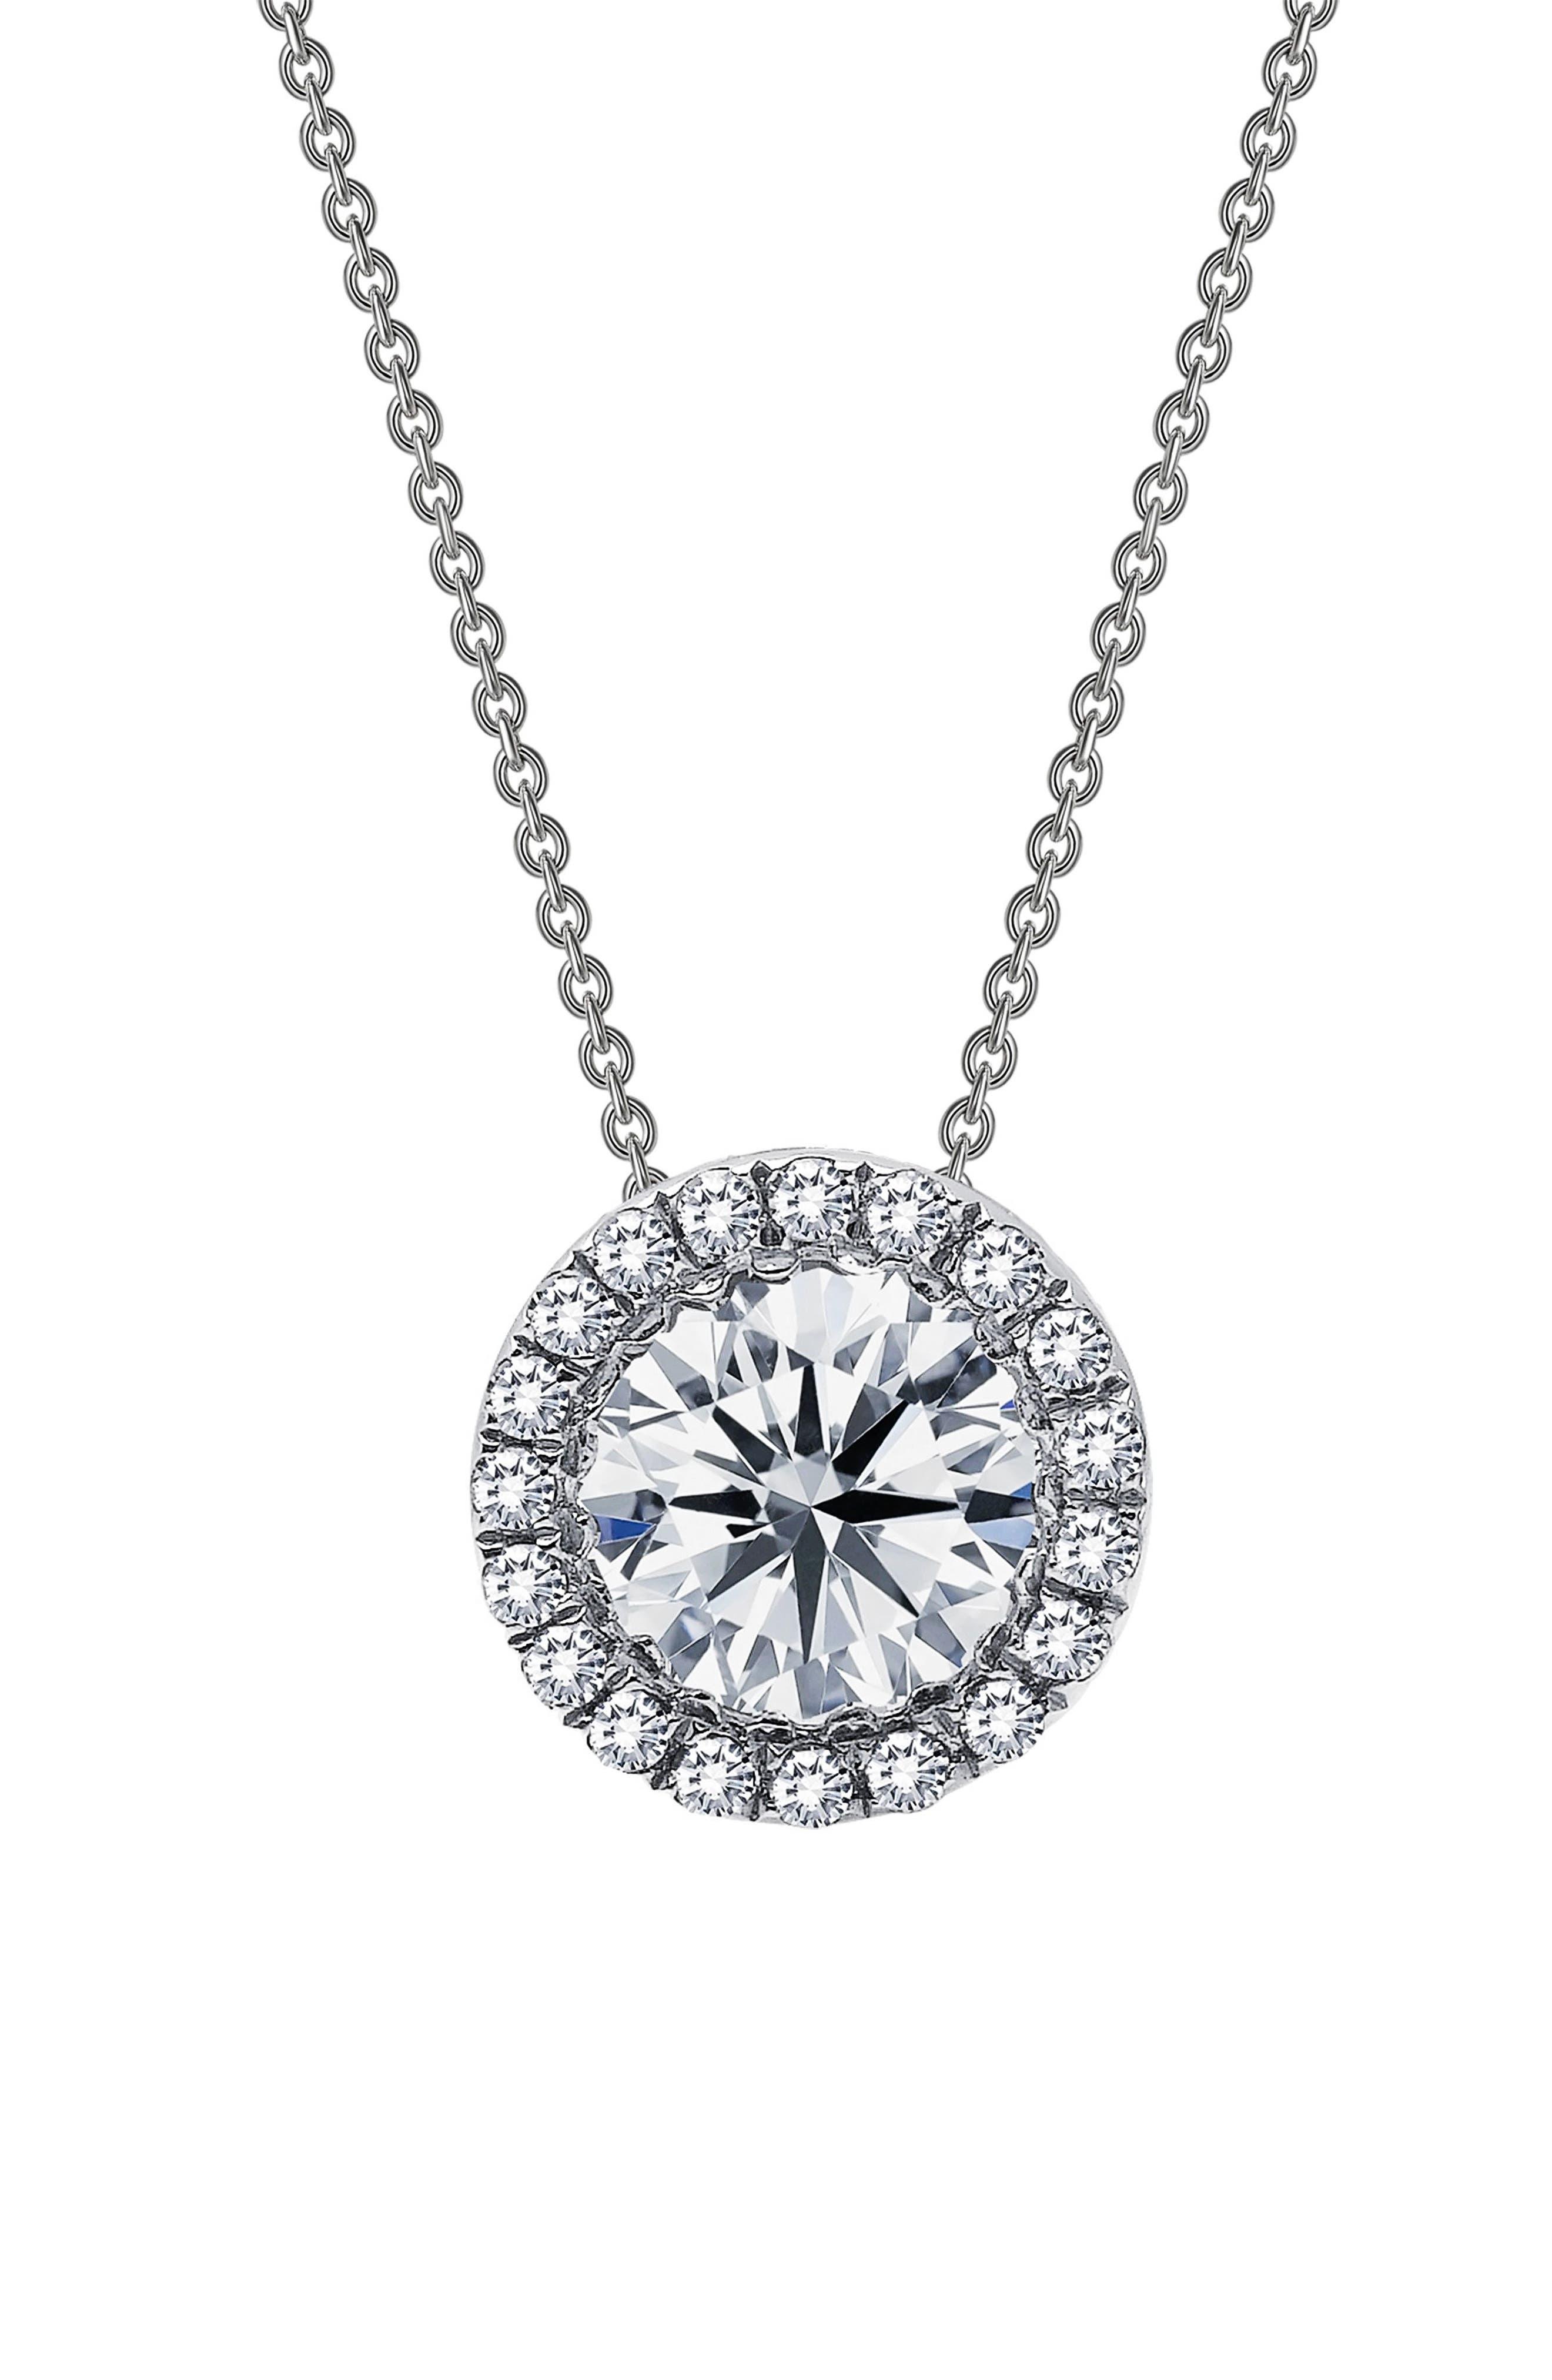 Simulated Diamond Halo Pendant Necklace,                             Main thumbnail 1, color,                             SILVER